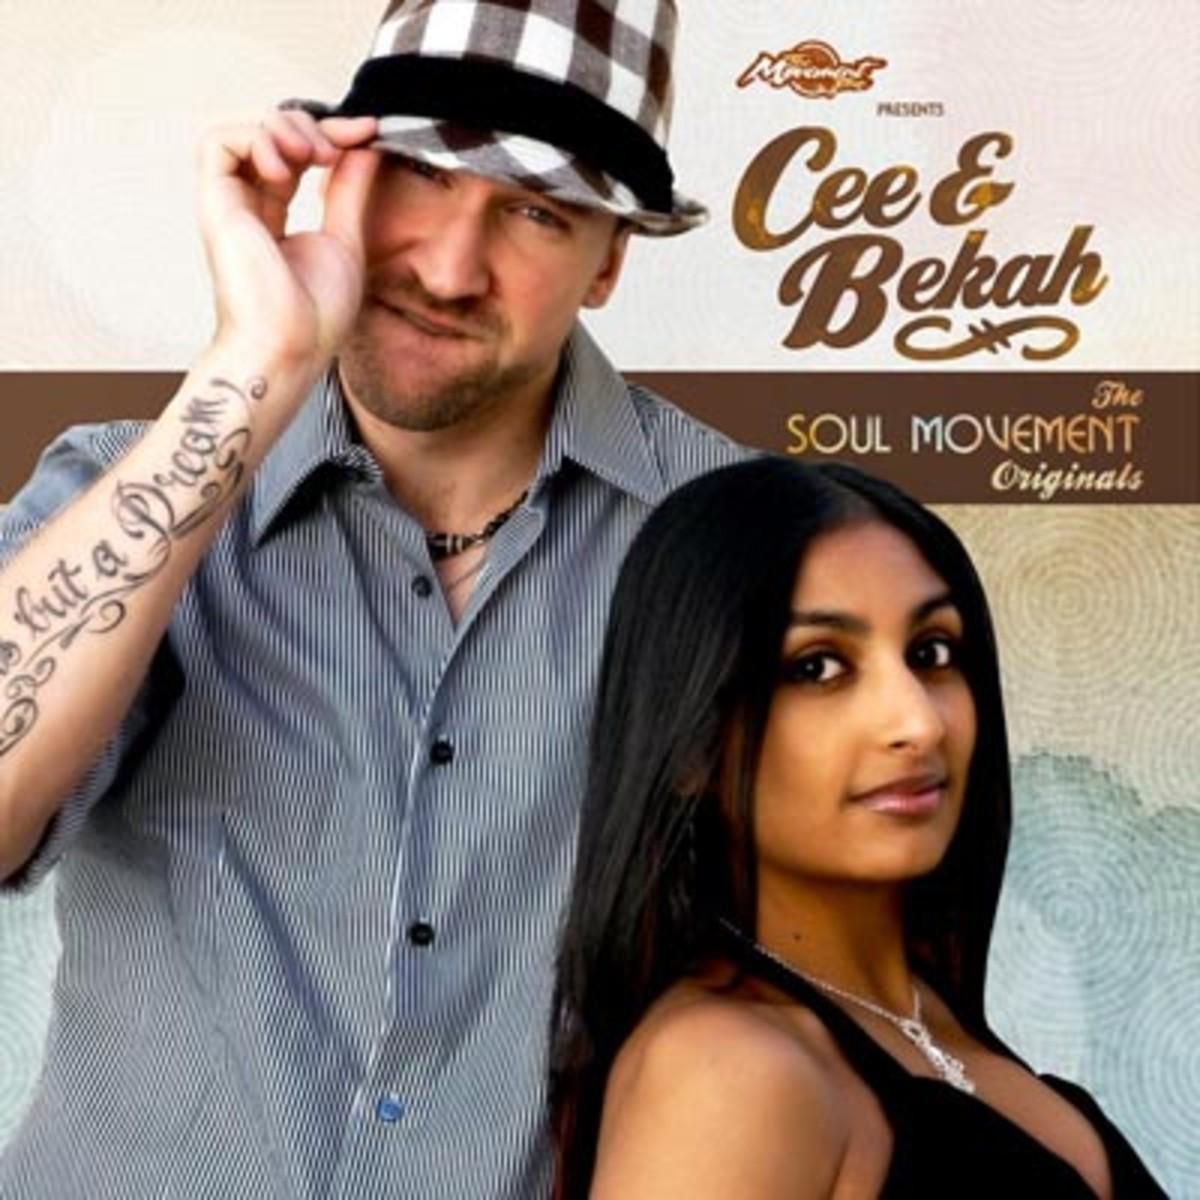 cee-bekah-soul-movement.jpg